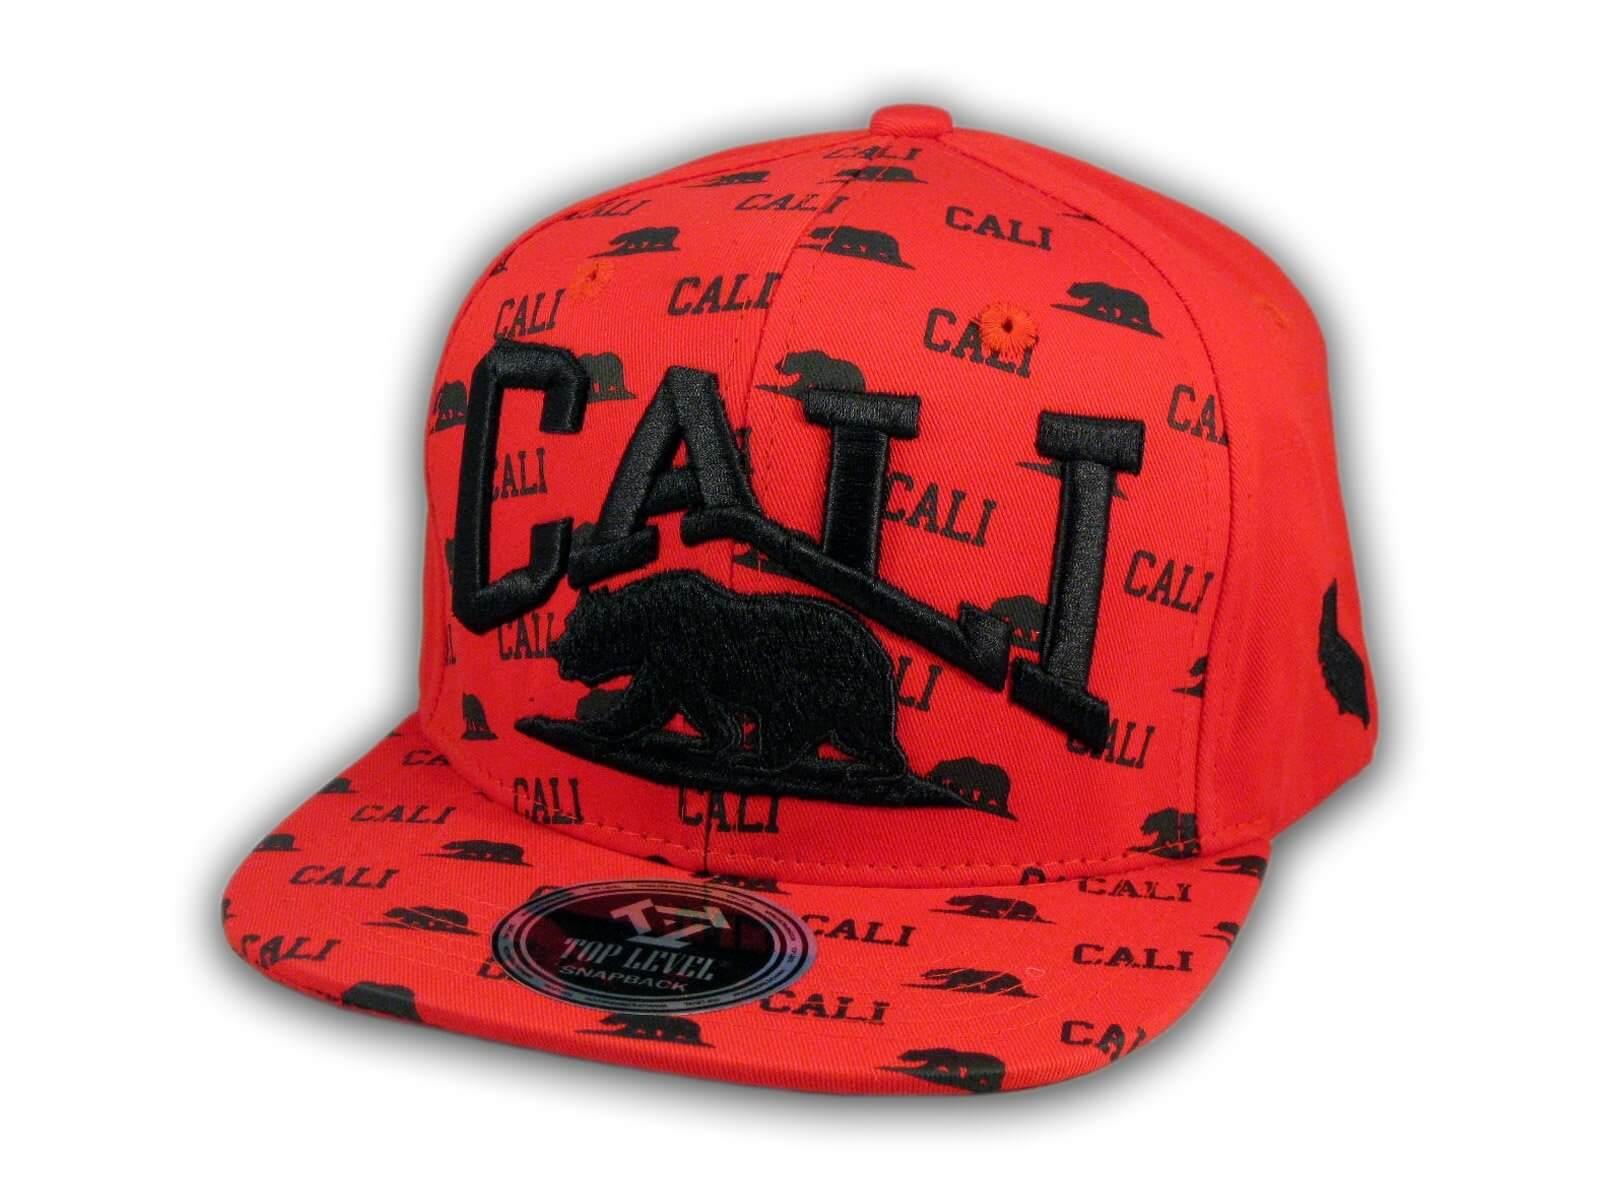 272e314c California Republic Bear Red and Black Flat Bill Hat - Printed T ...